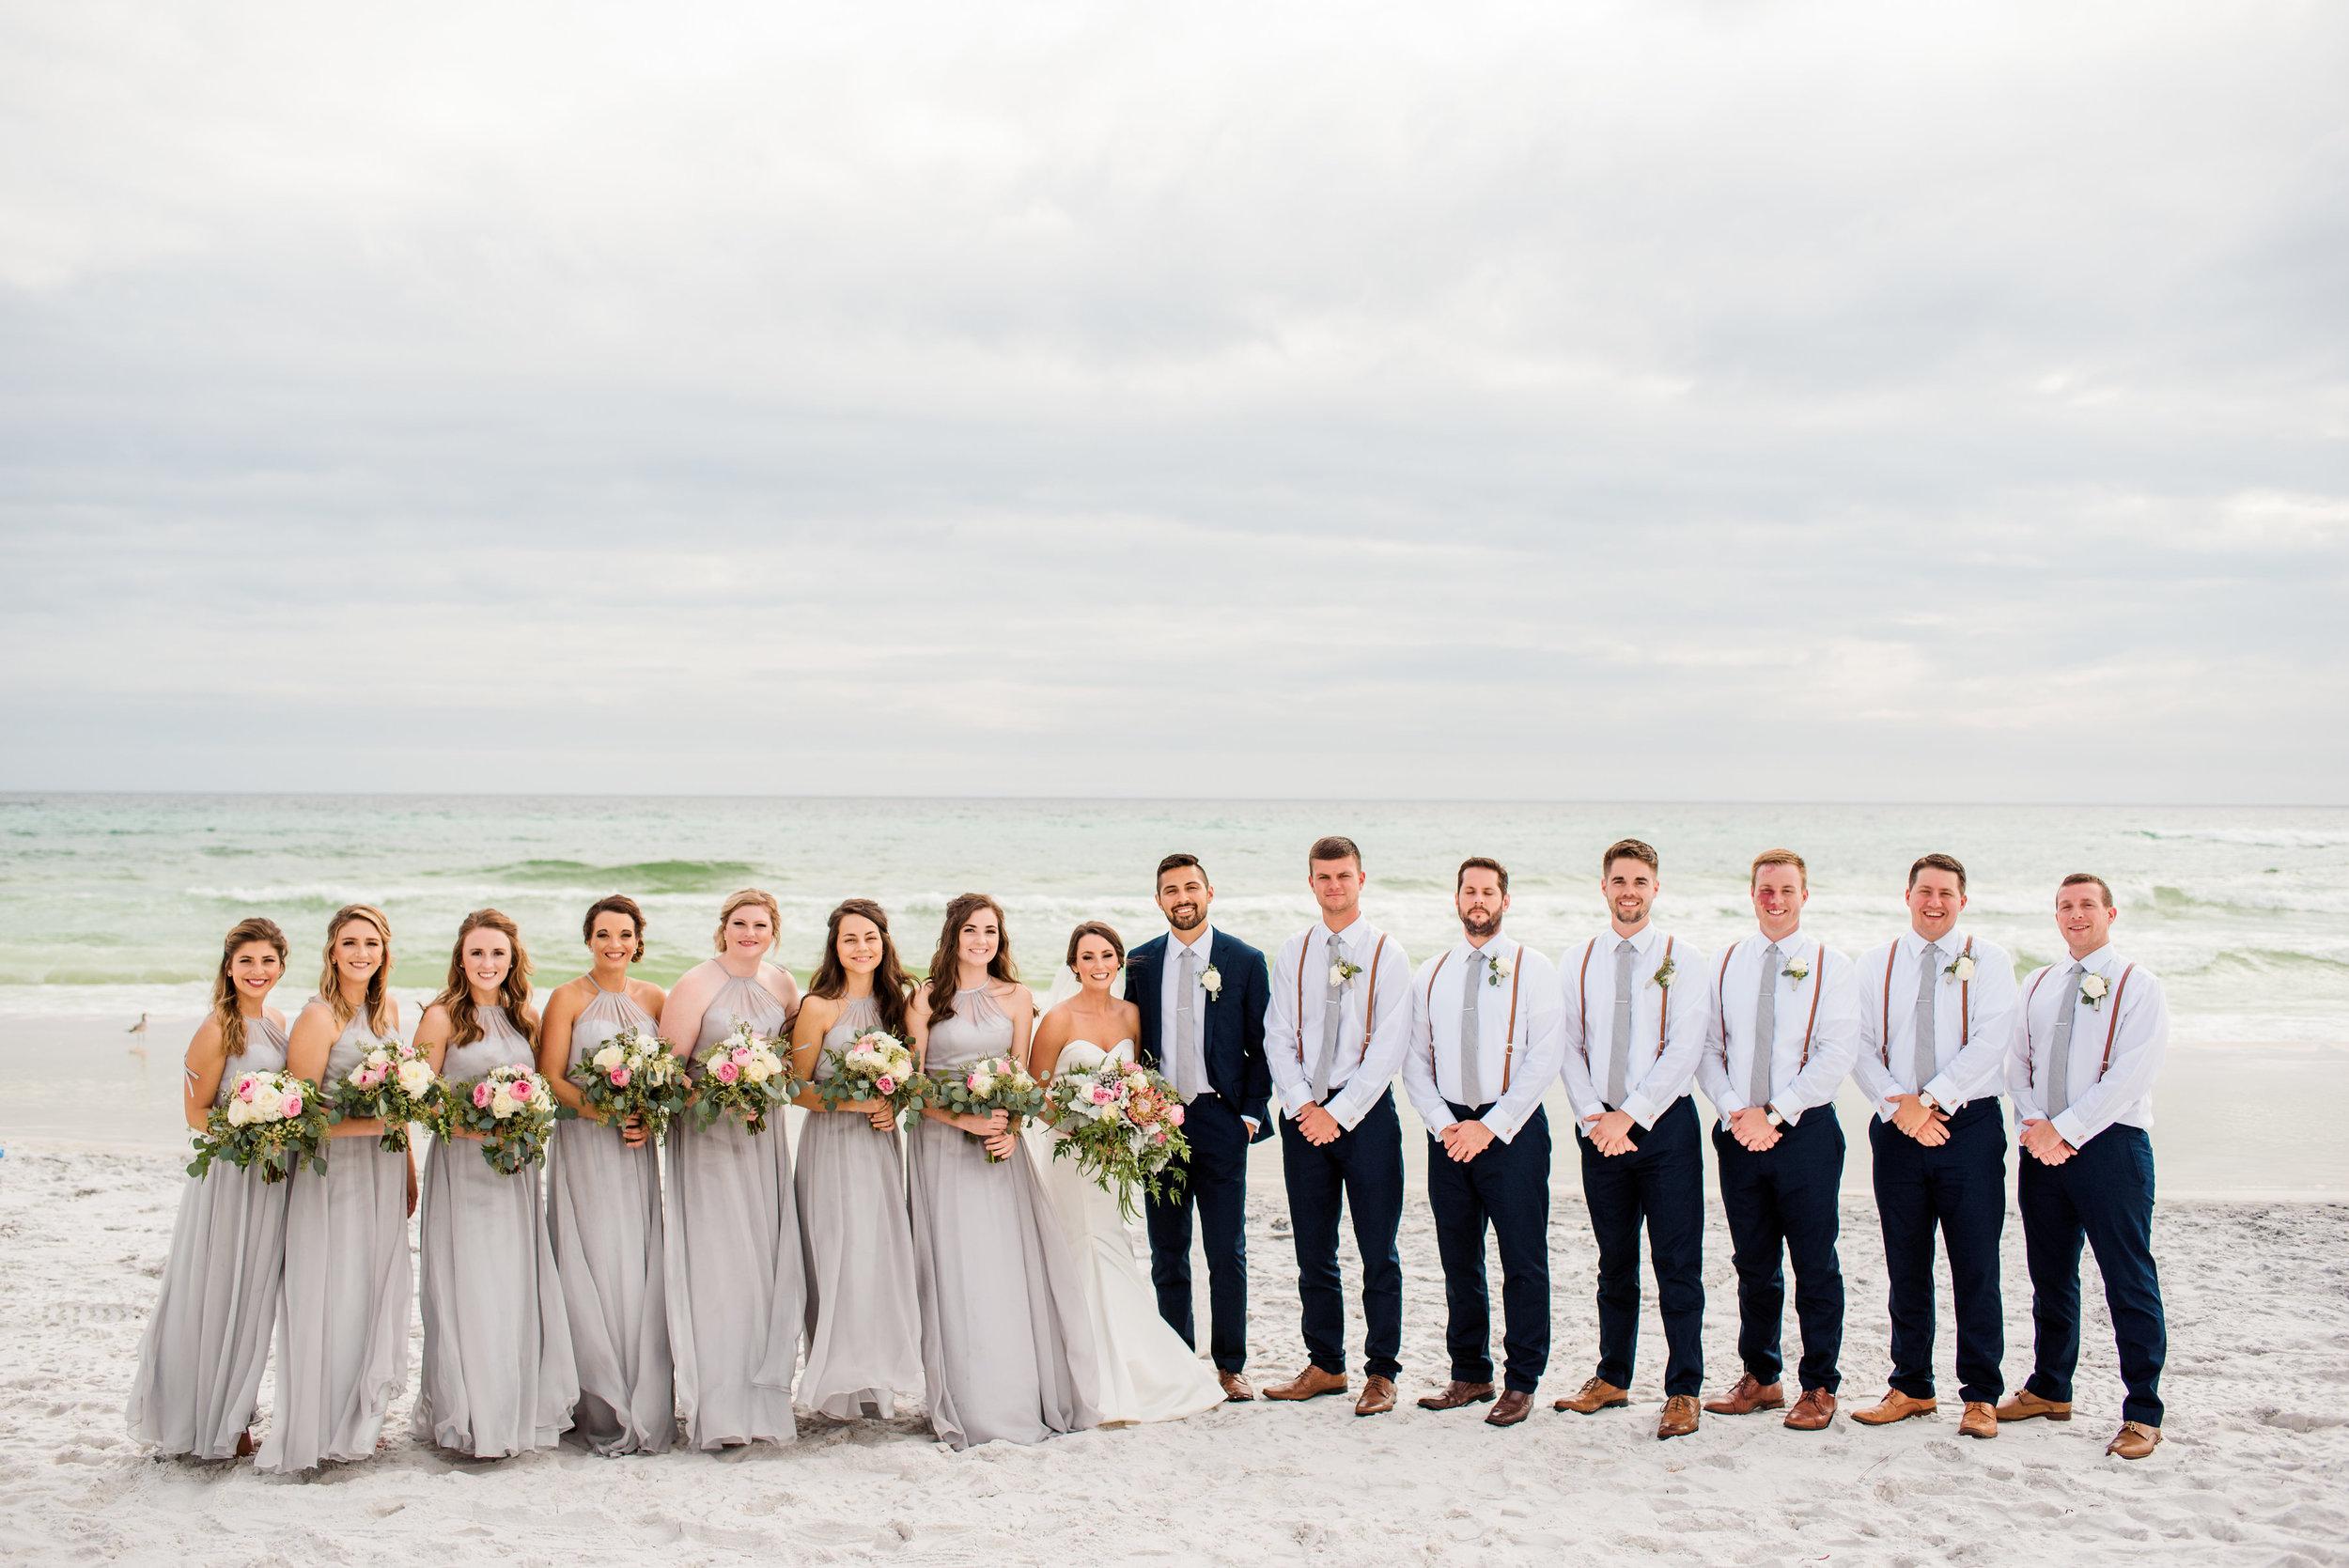 Santa Rosa Beach Wedding20.jpg